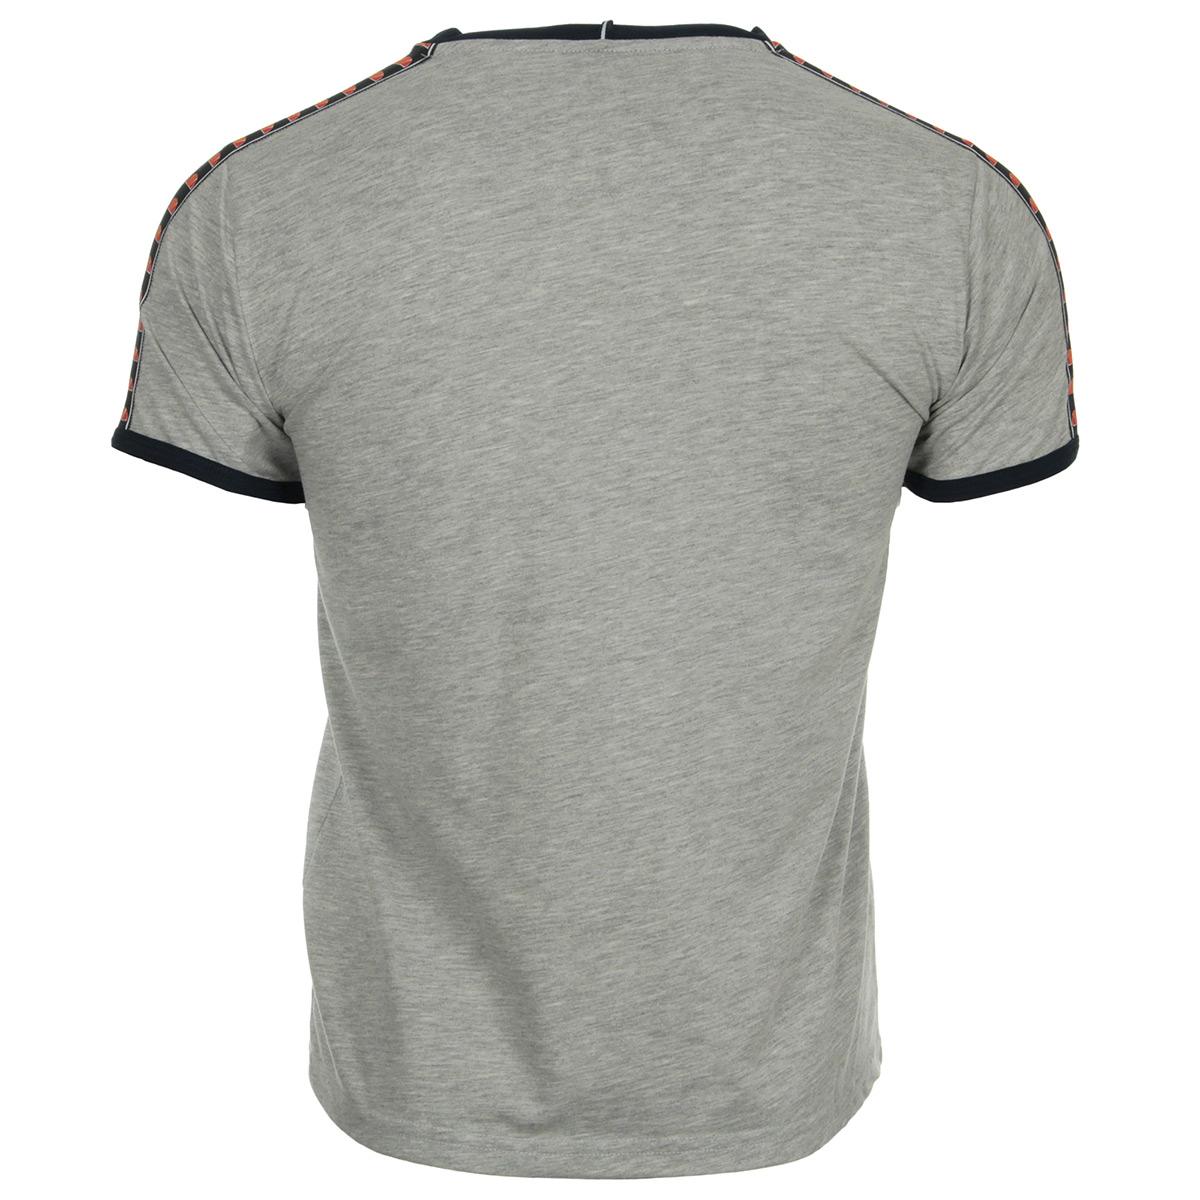 Ellesse T-Shirt EH Homme Bande Gris Chiné 1031NBANDEGRISCHINE, T-Shirts homme